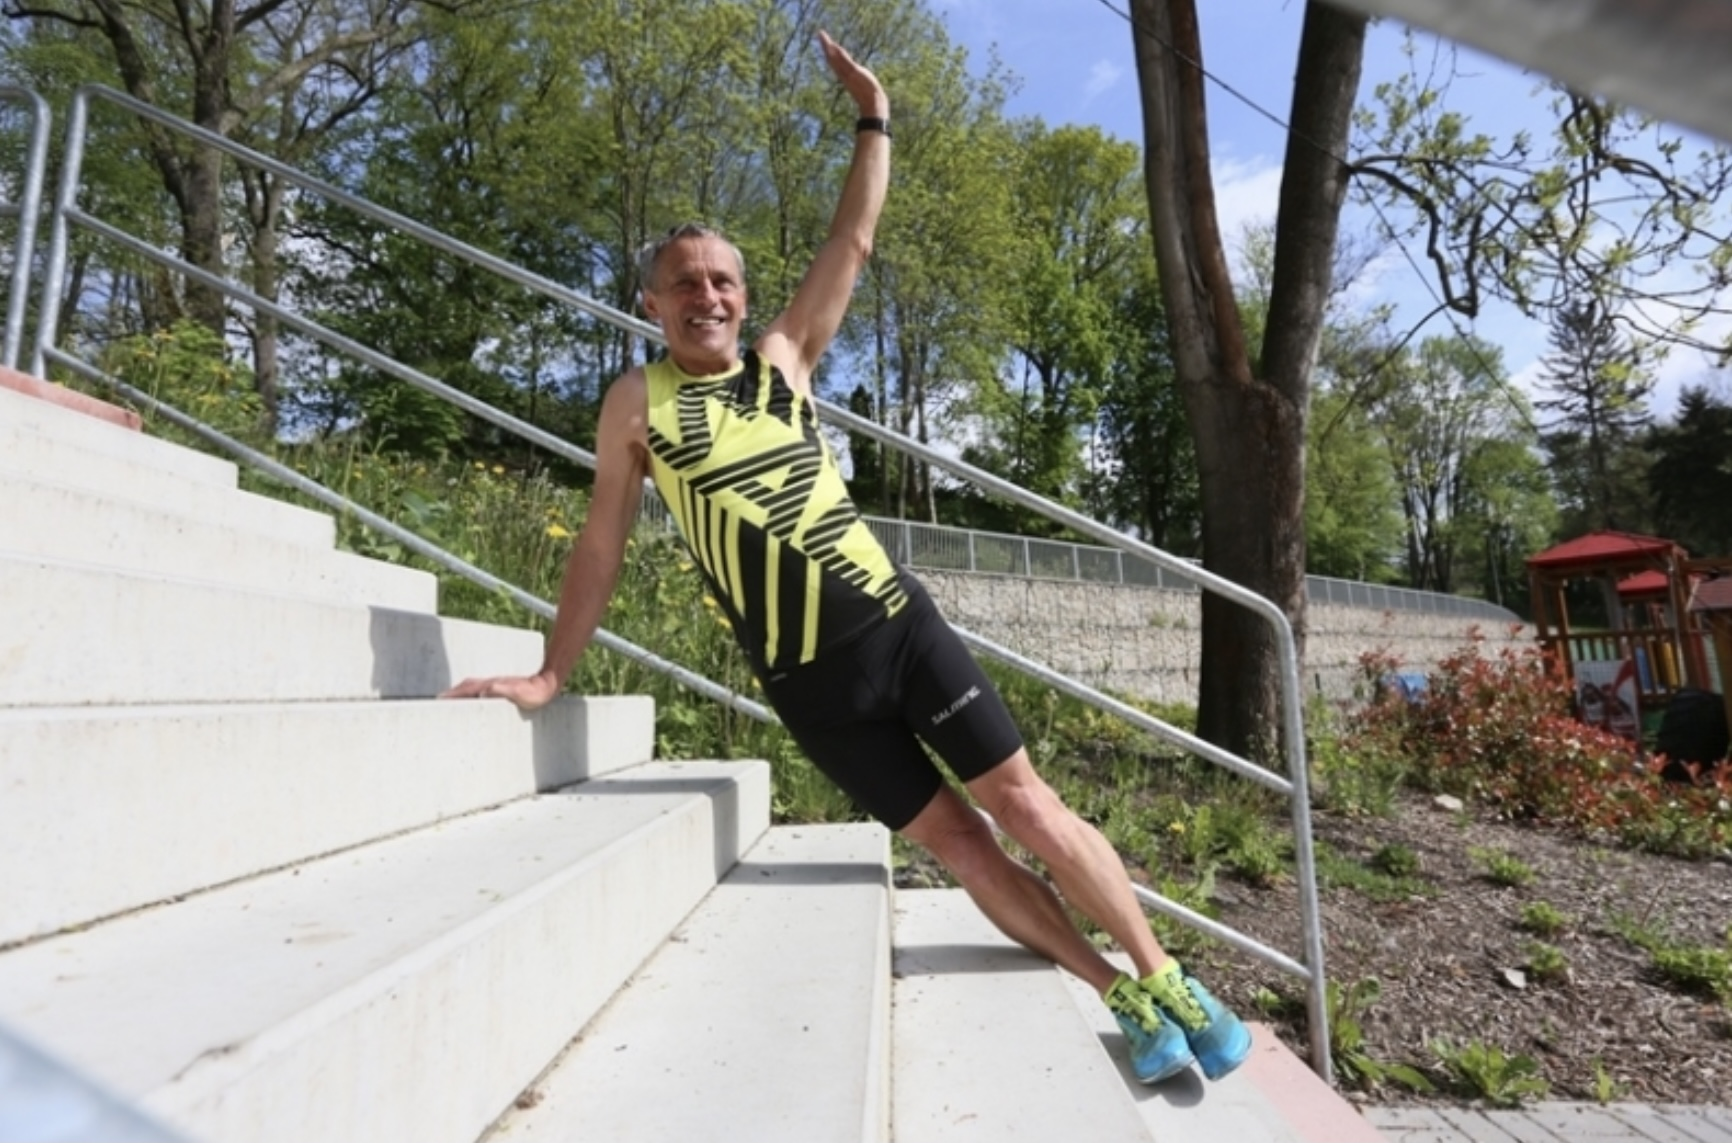 Schází ti kopce, běhej a cvič na schodech - prkno s rotací 2